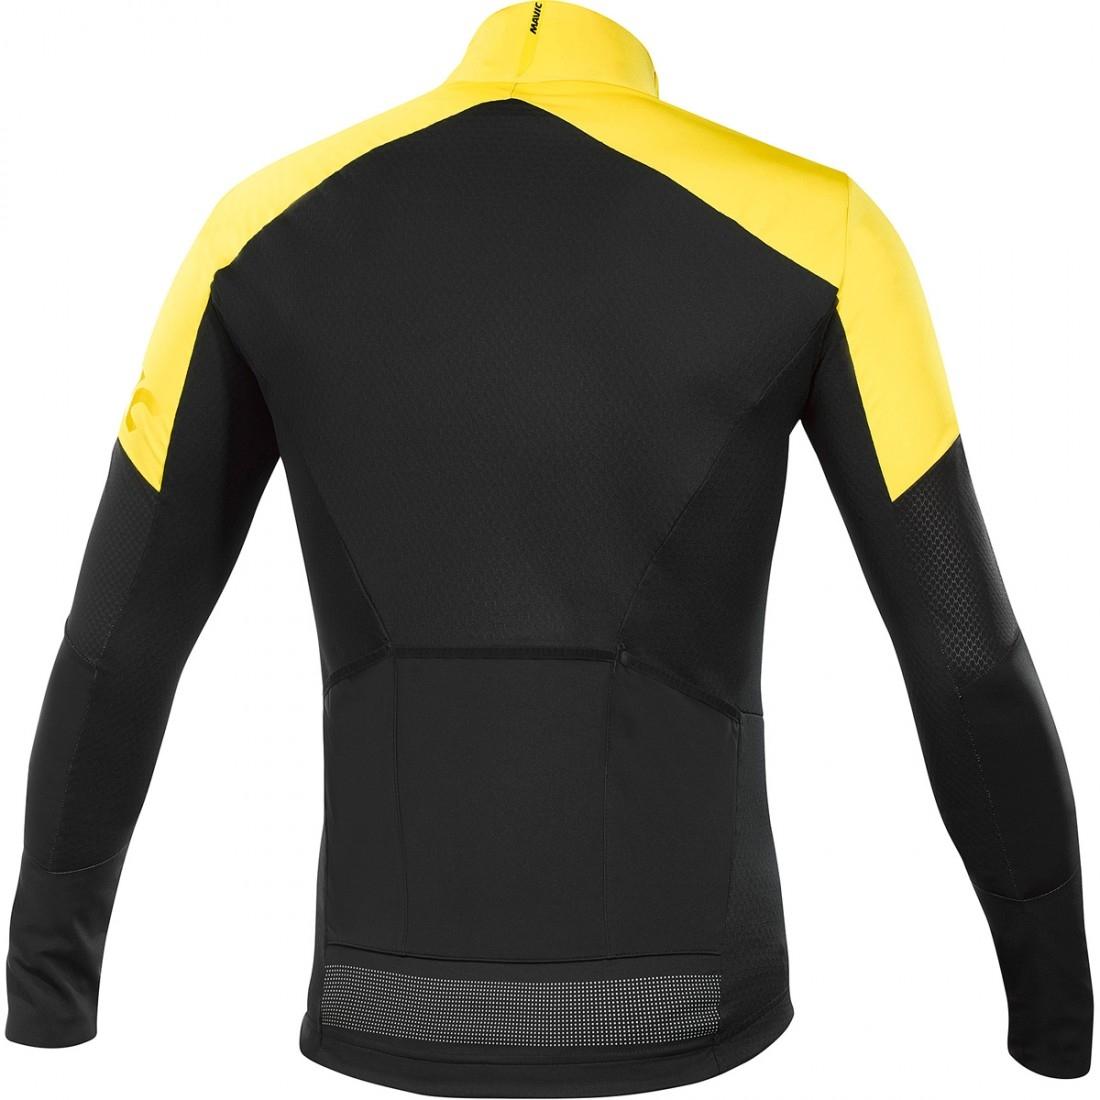 3acca9de8b7 Bike Trikot MAVIC Cosmic Pro Wind Black / Yellow Mavic · Motocard